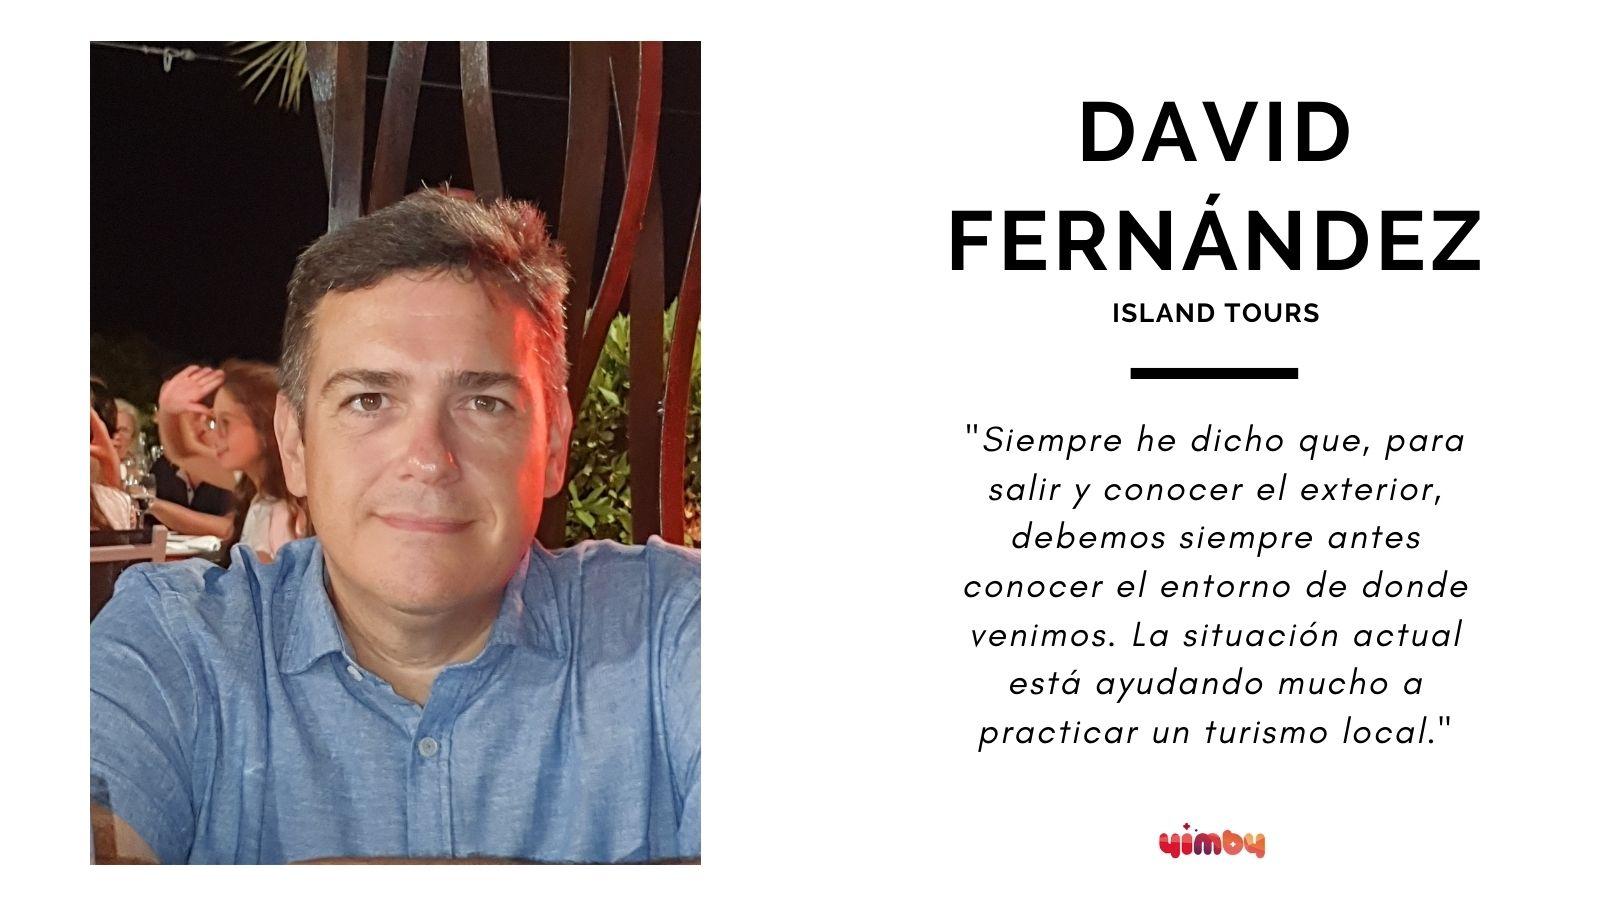 Entrevista David Fernández de Island Tours - Imagen Portada